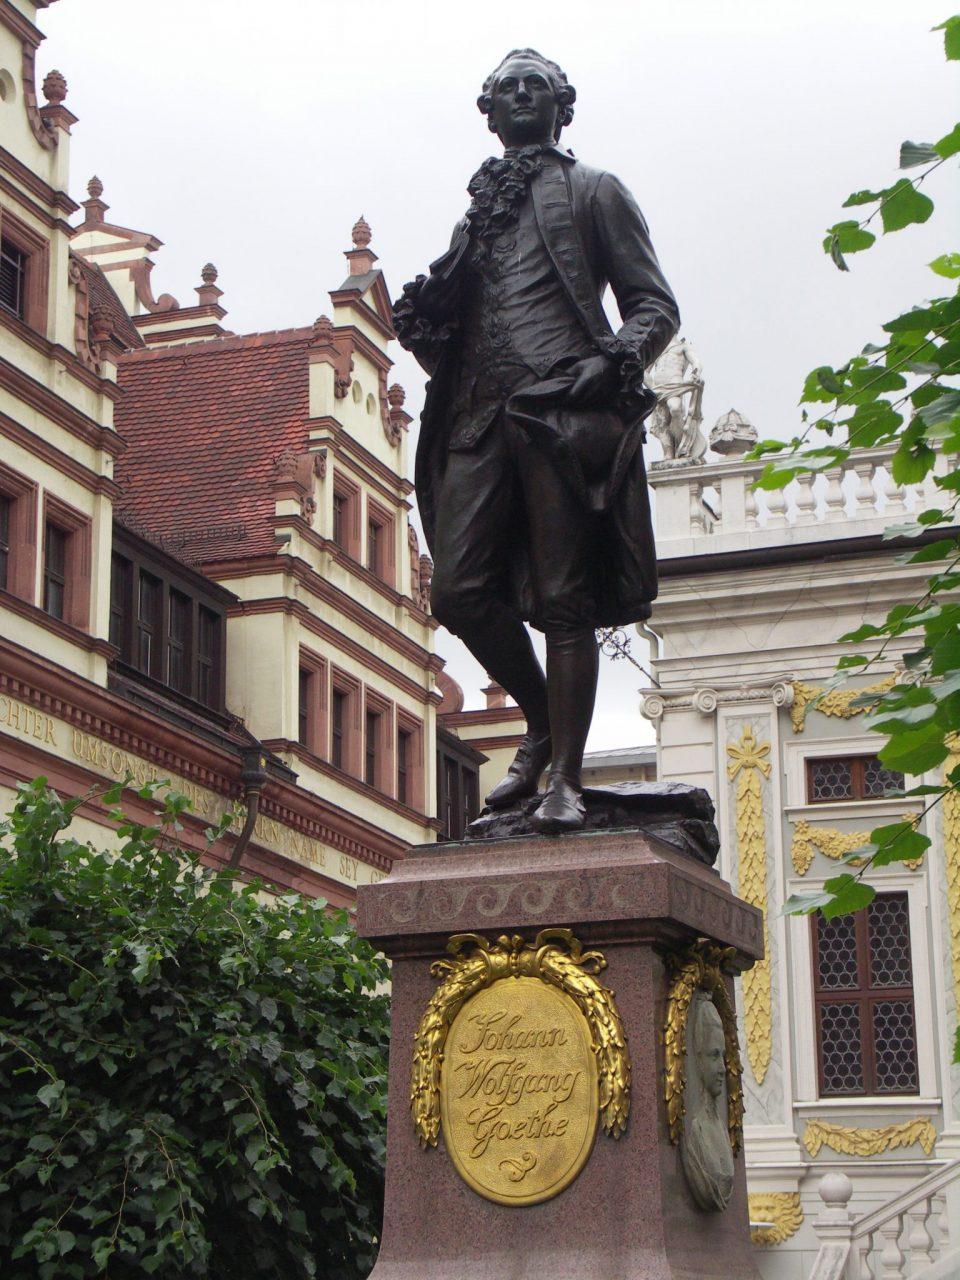 Goethe Statue in Leipzig